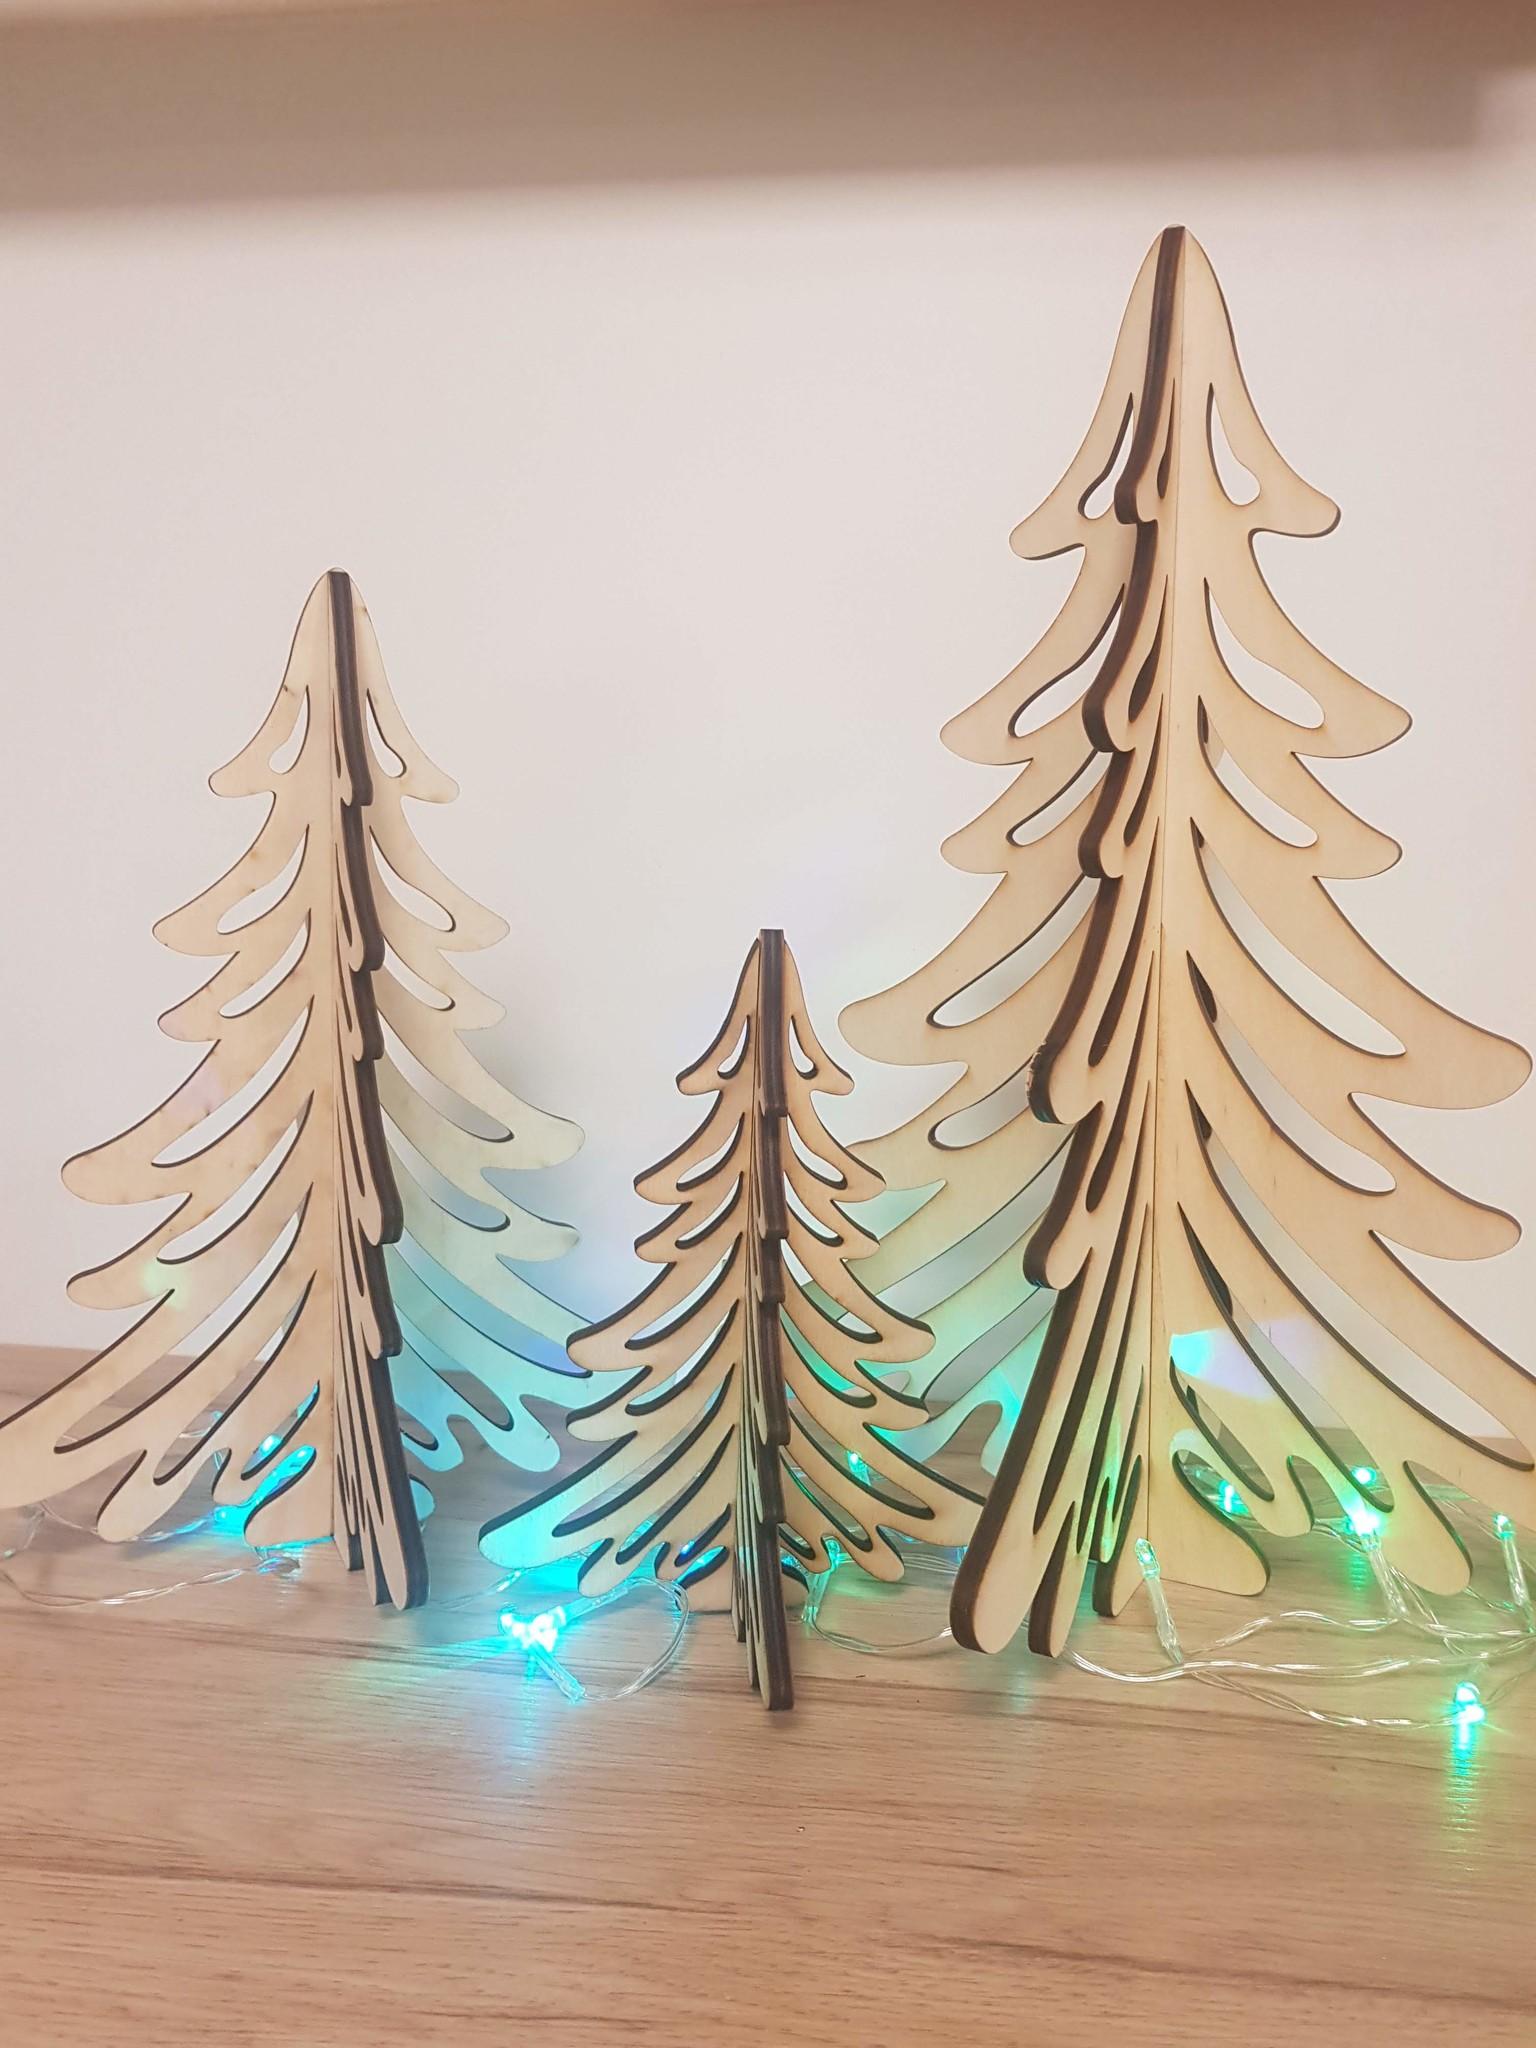 Kerstboom uit hout